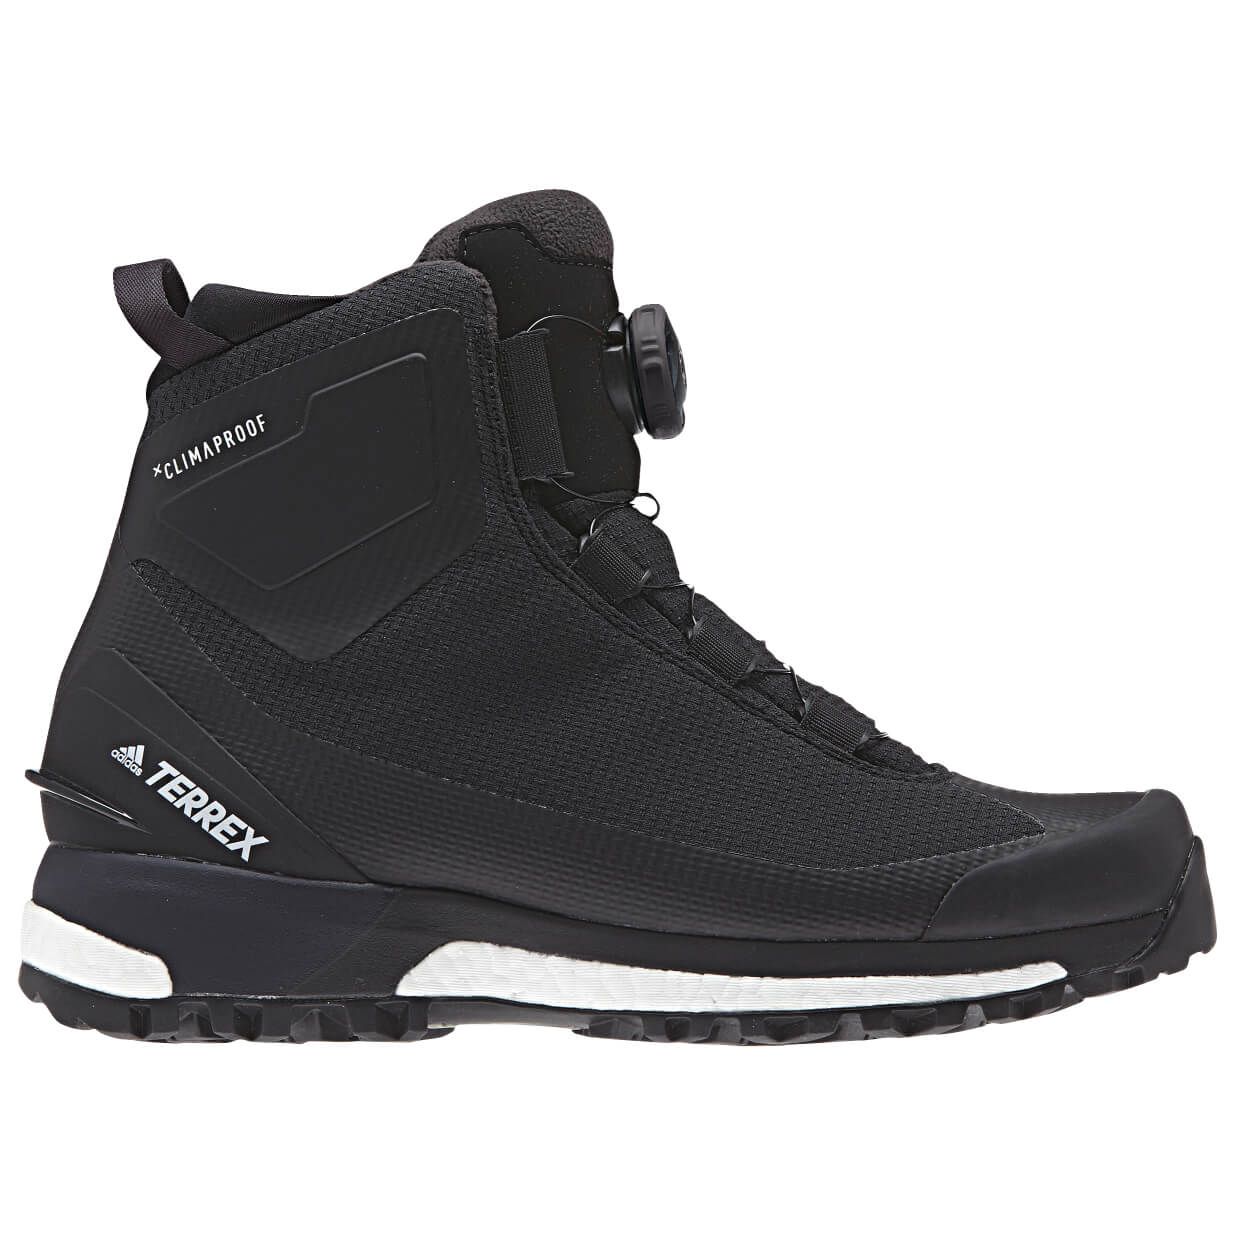 Winterschuhe Ch Adidas Conrax Cp Terrex Boa Kaufen Herren Online bY6yIf7gv